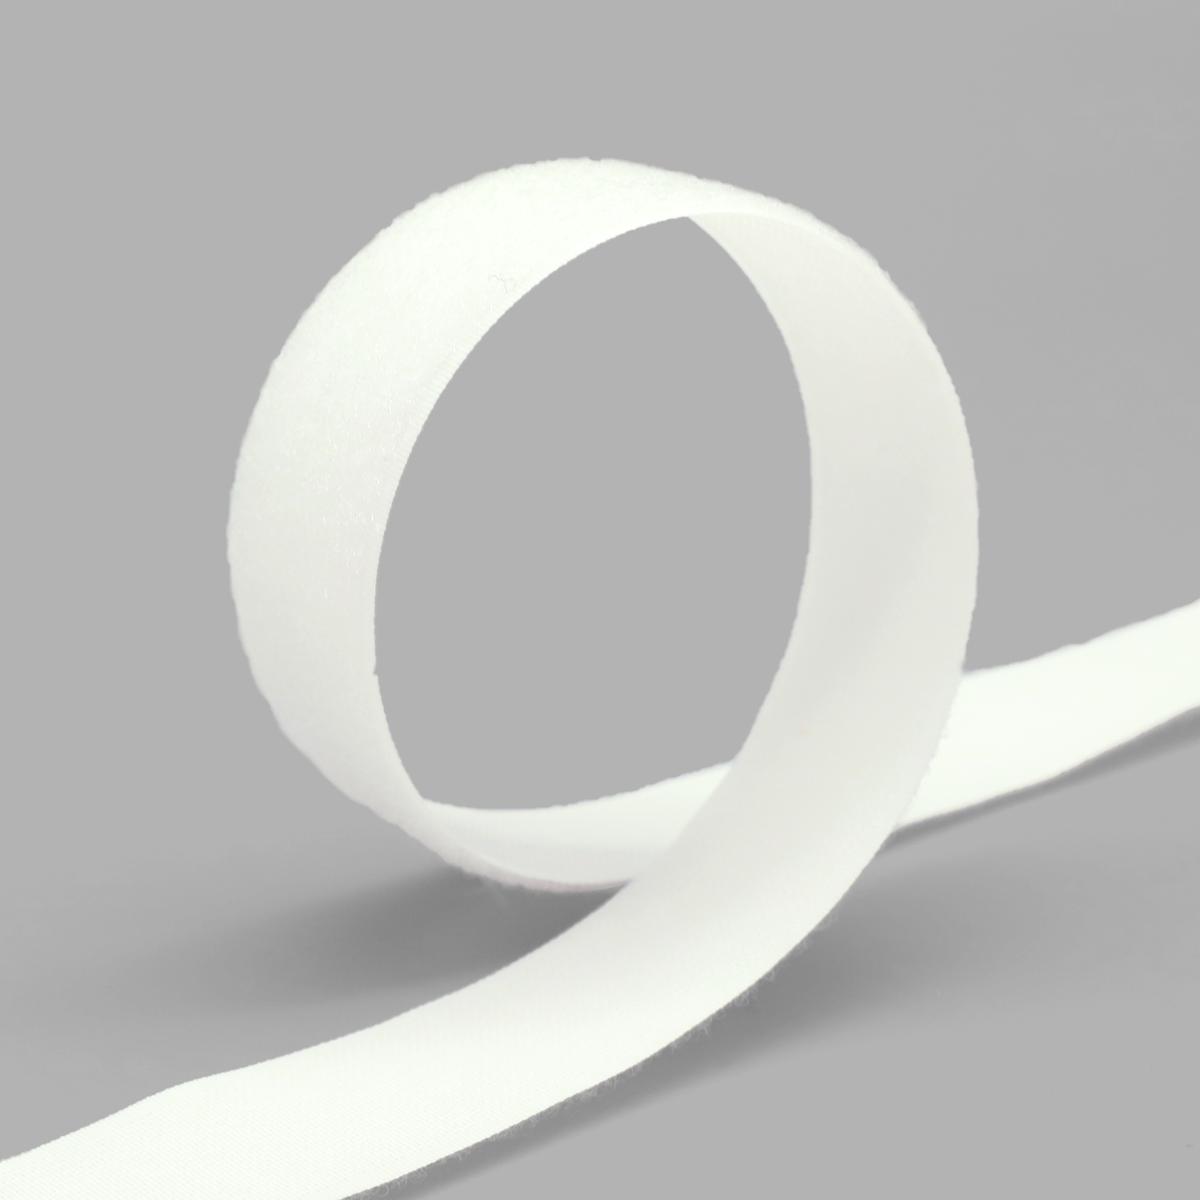 20204 Лента контактная 30мм. 25м 'петля' (бел.) фото